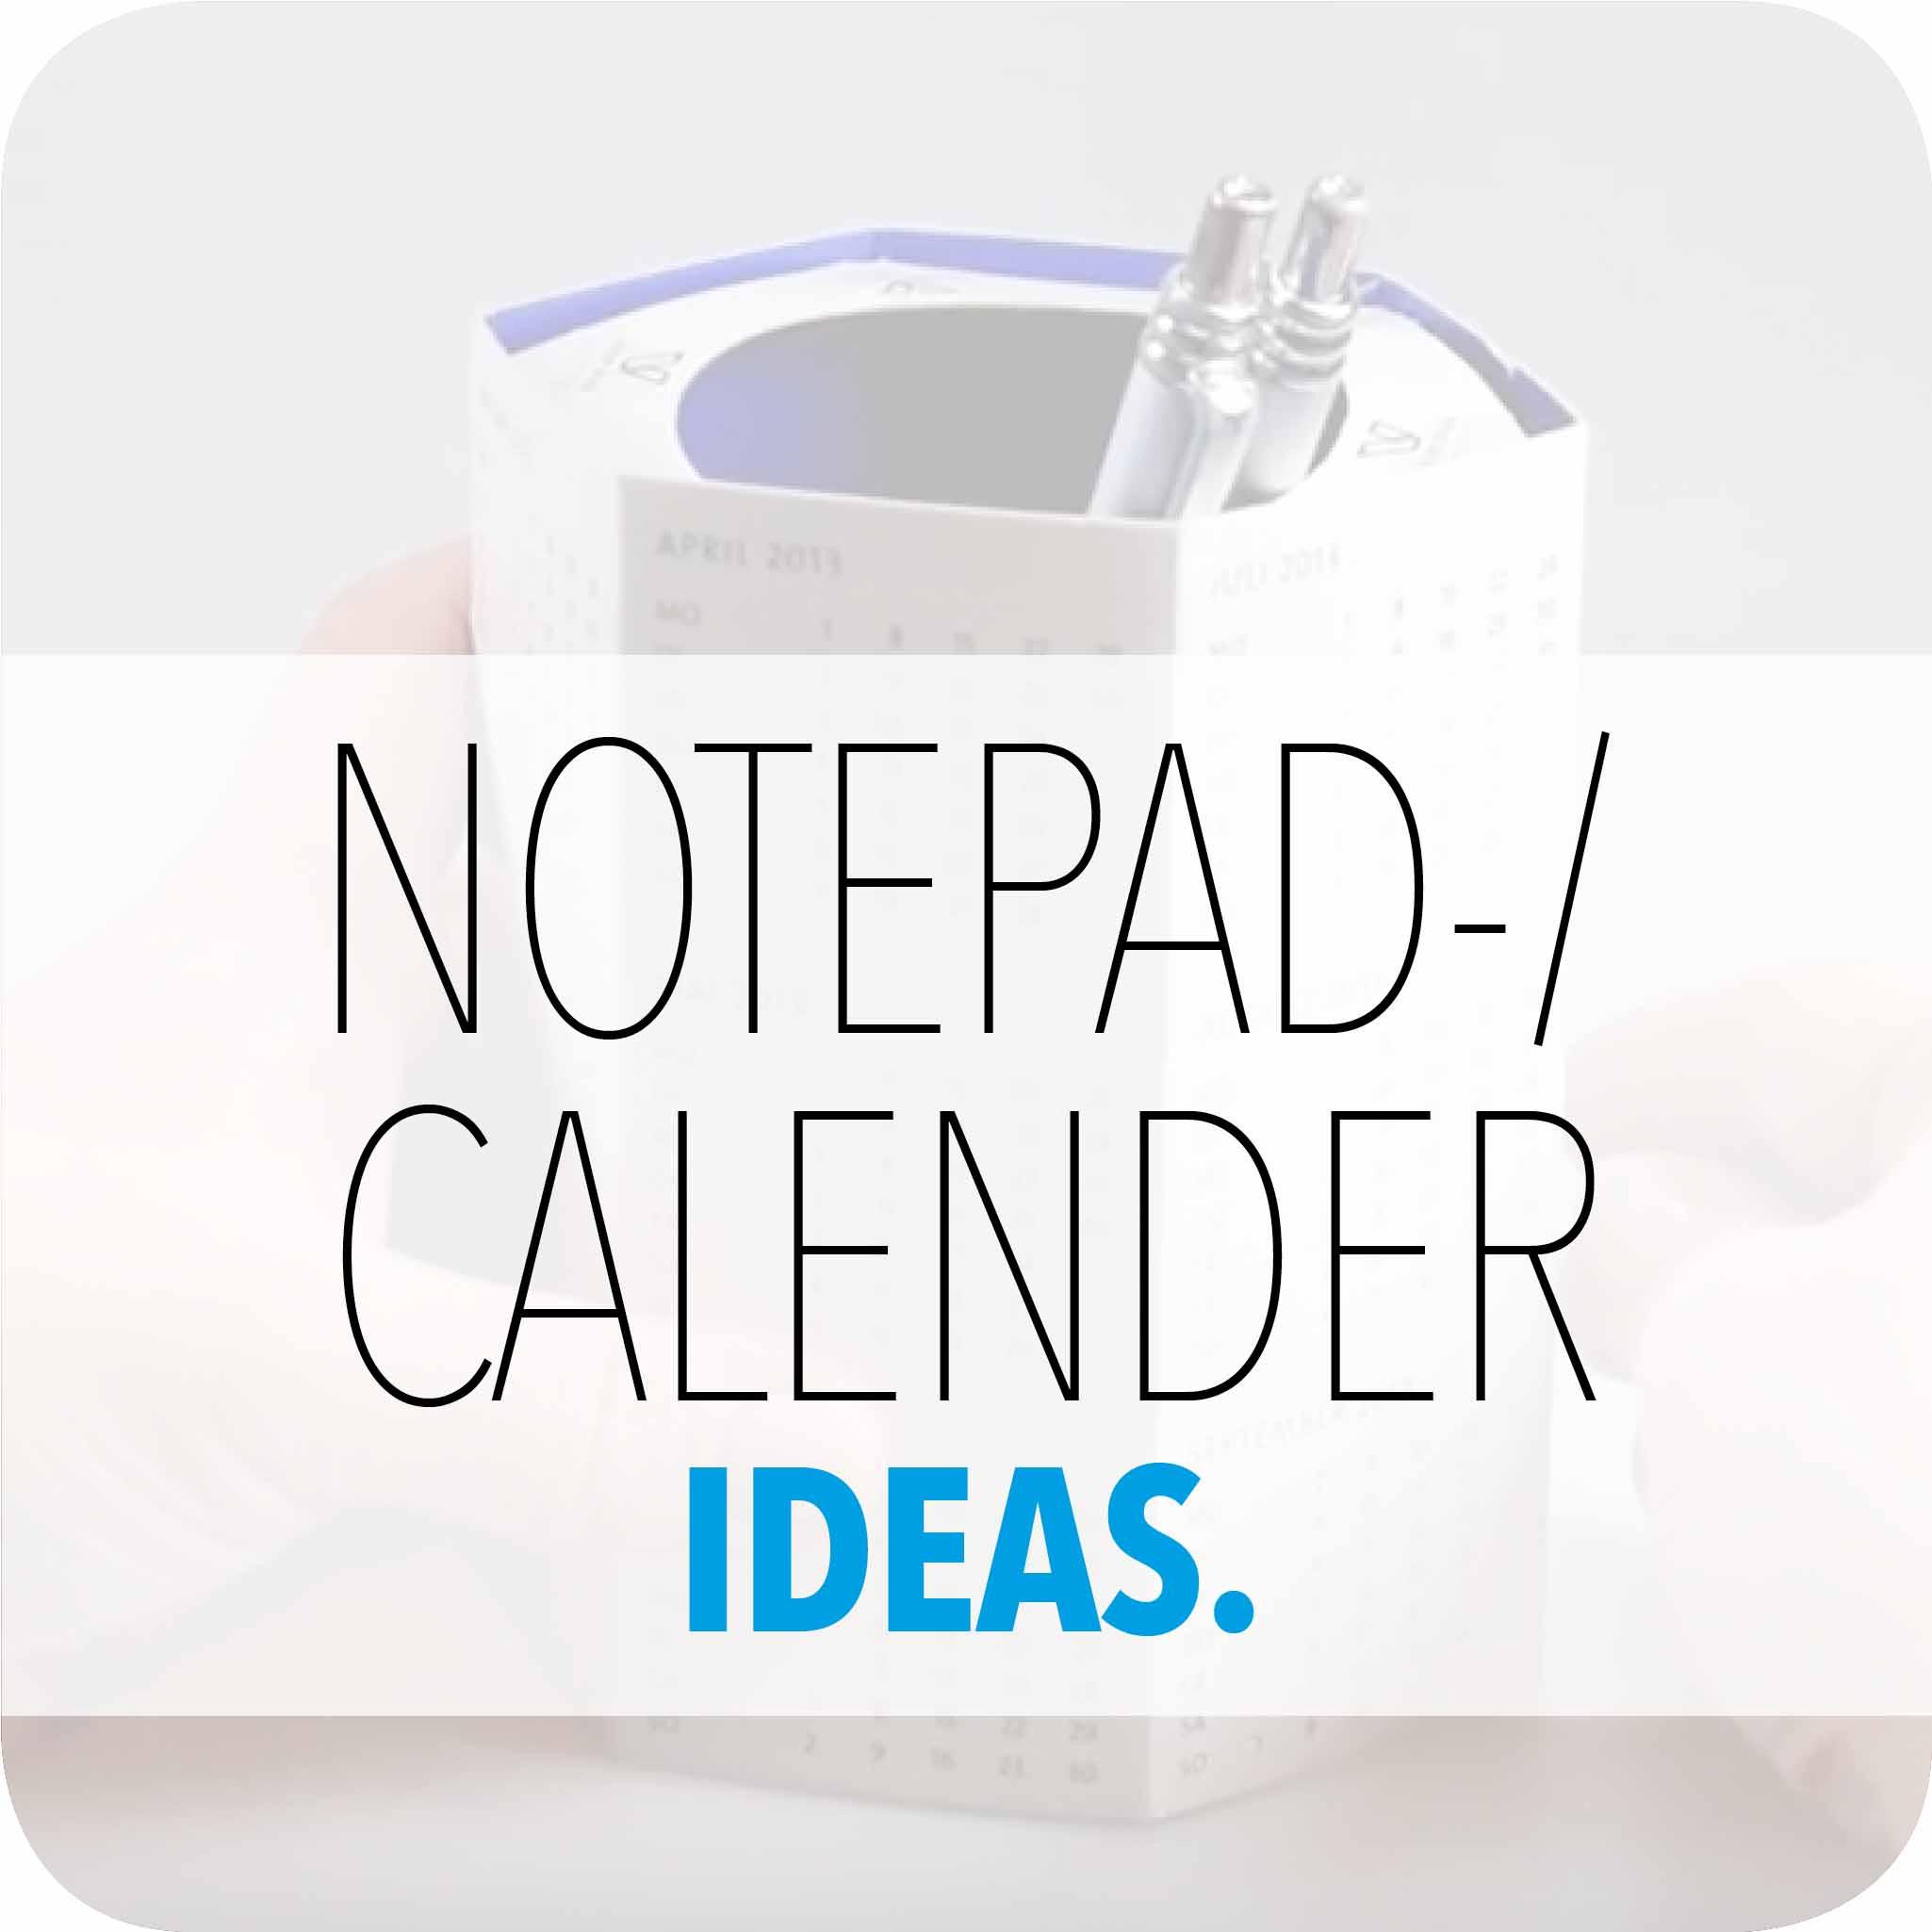 NOTEPAD-/CALENDERIDEAS